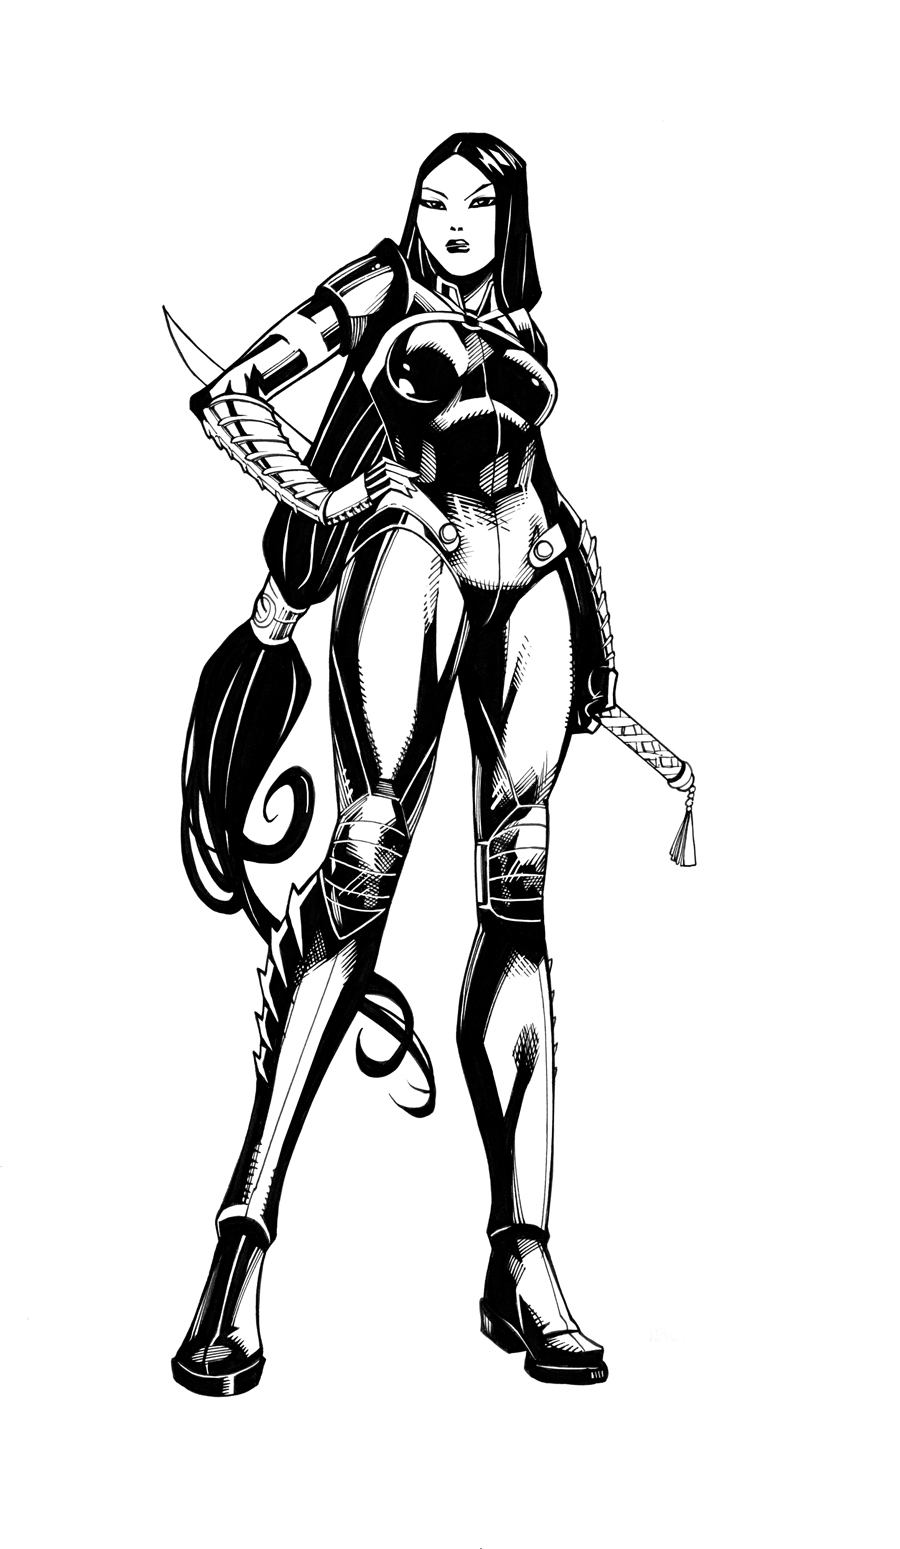 Lady Shiva inks